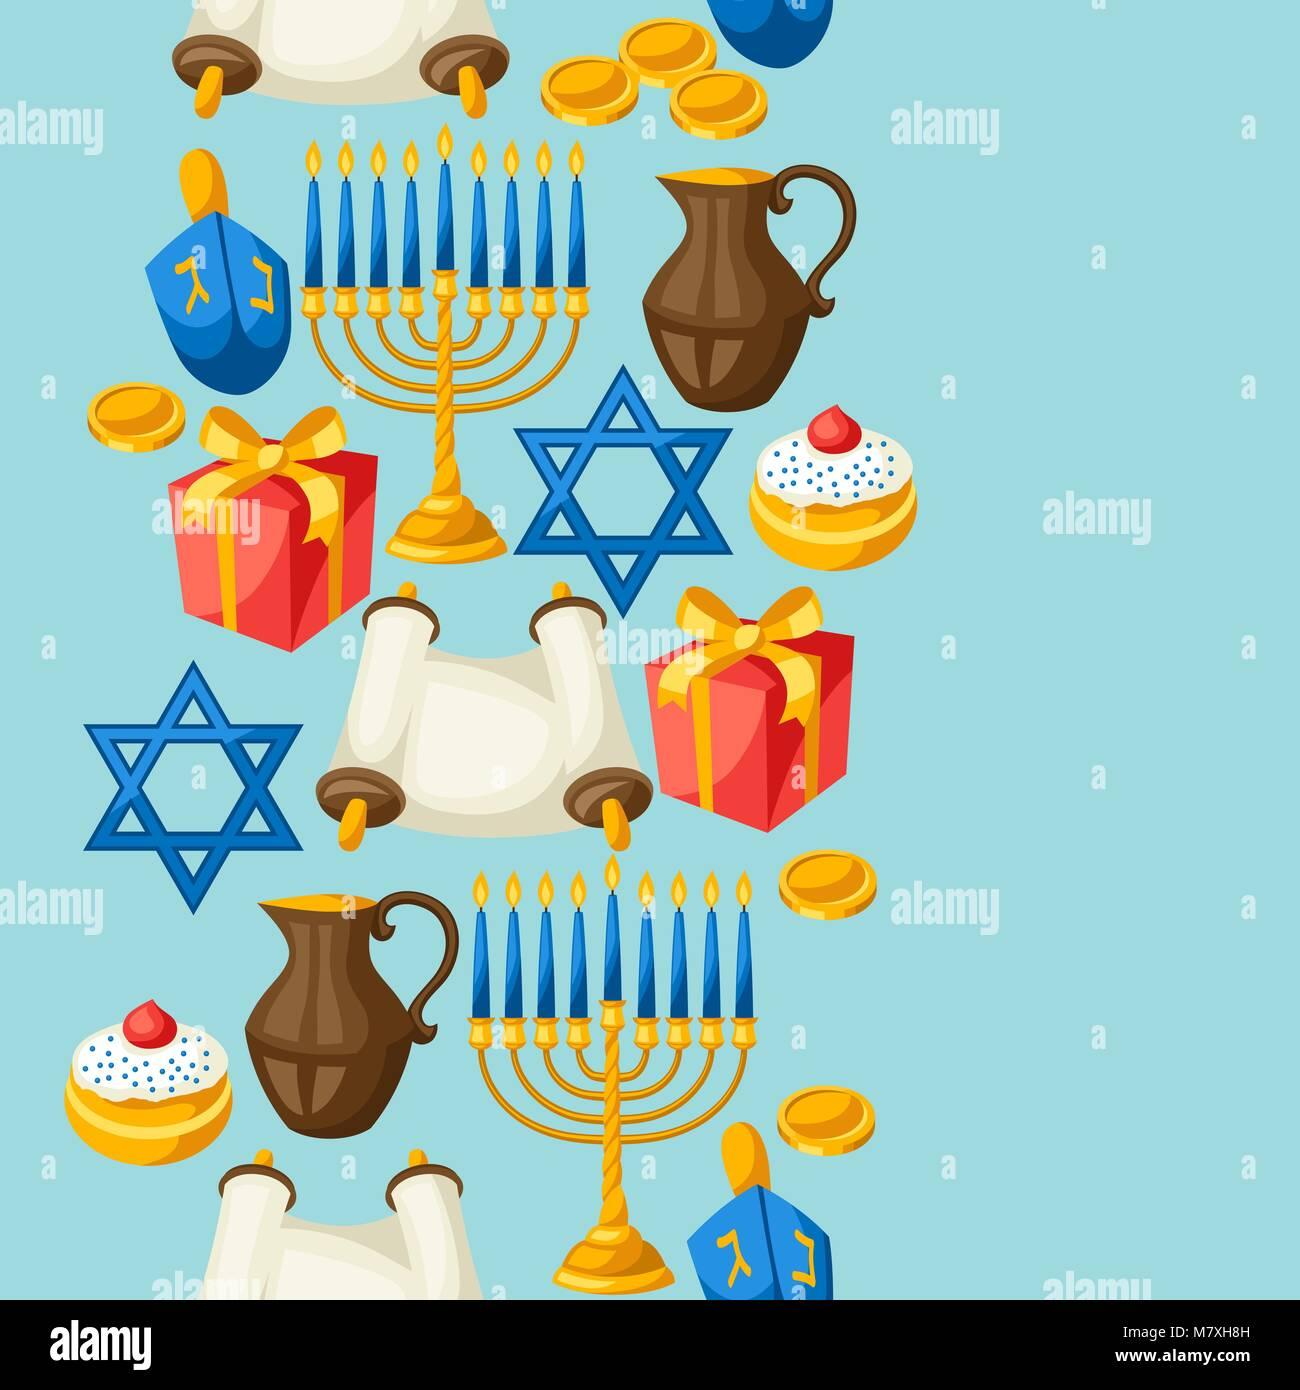 Jewish Hanukkah celebration seamless pattern with holiday objects - Stock Vector